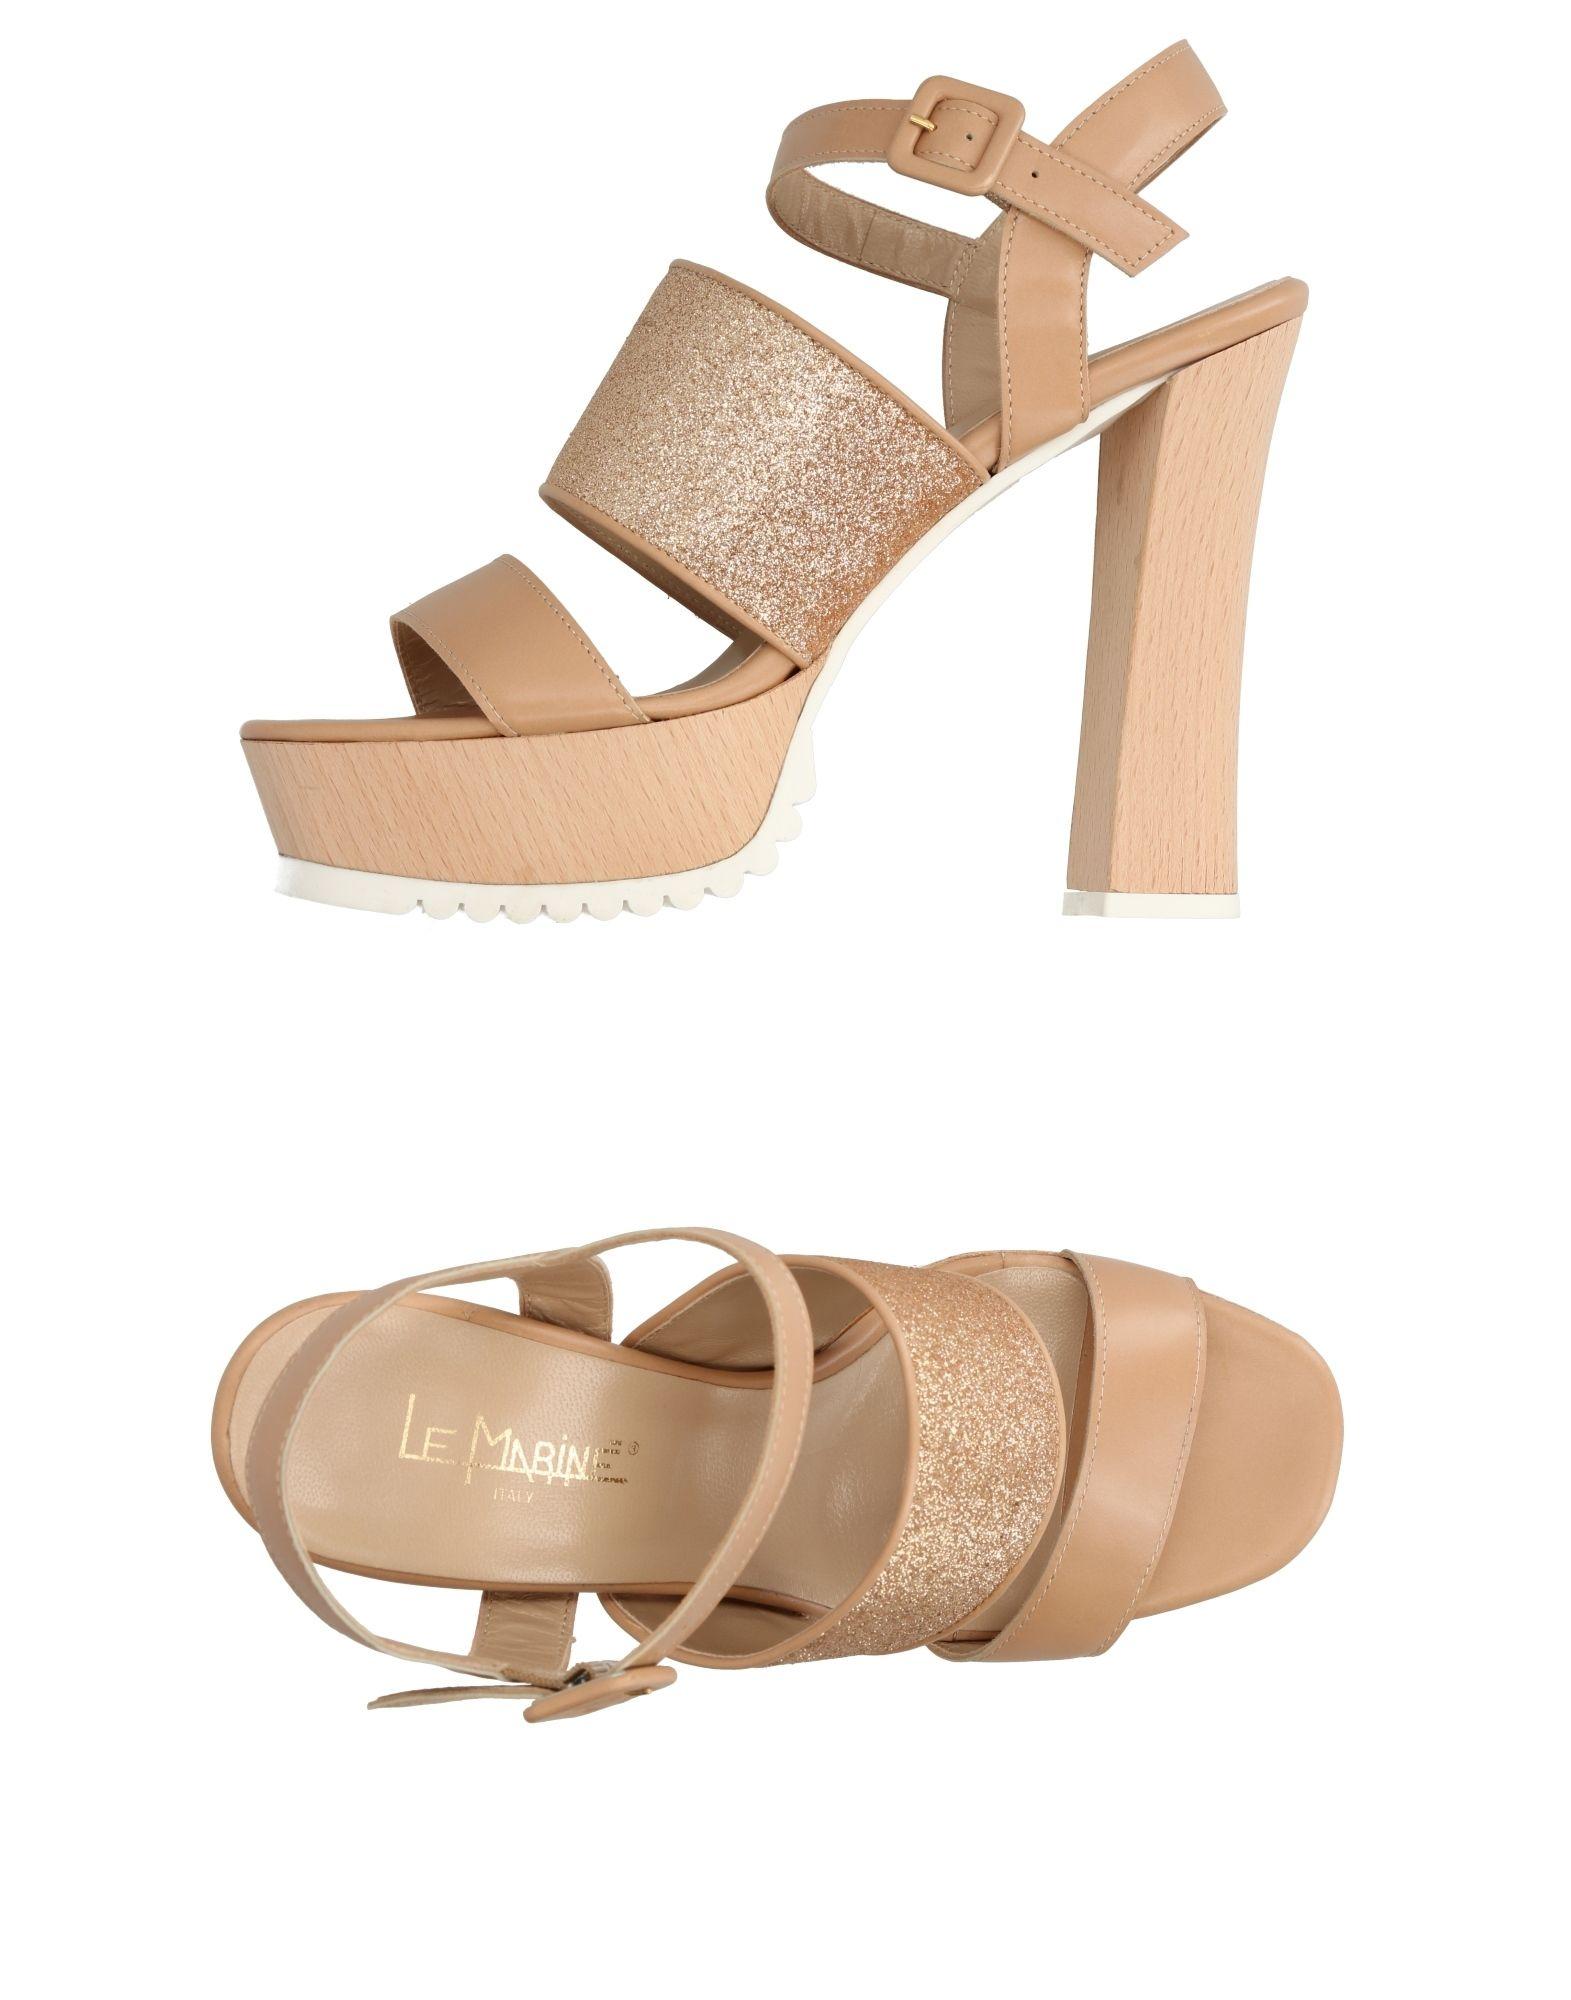 Le Marinē Sandalen Damen  11278404KM Gute Qualität beliebte Schuhe